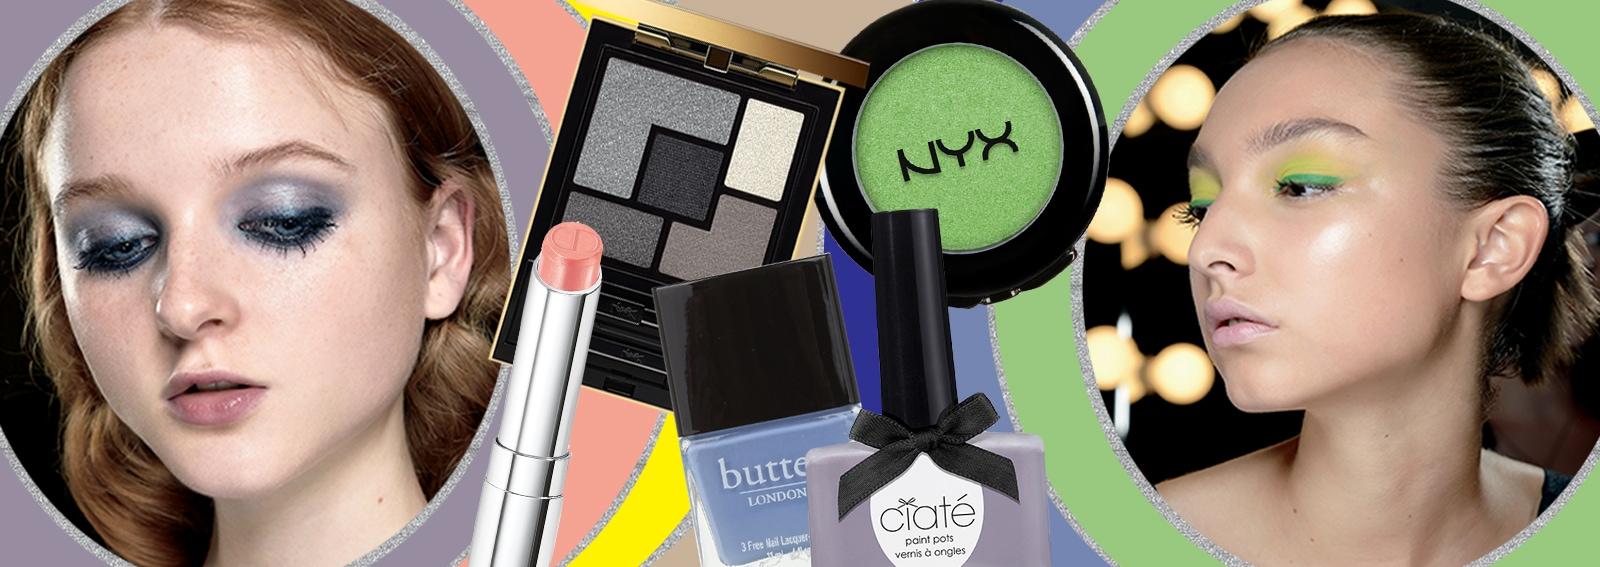 i-colori-make-up-primavera-desktop